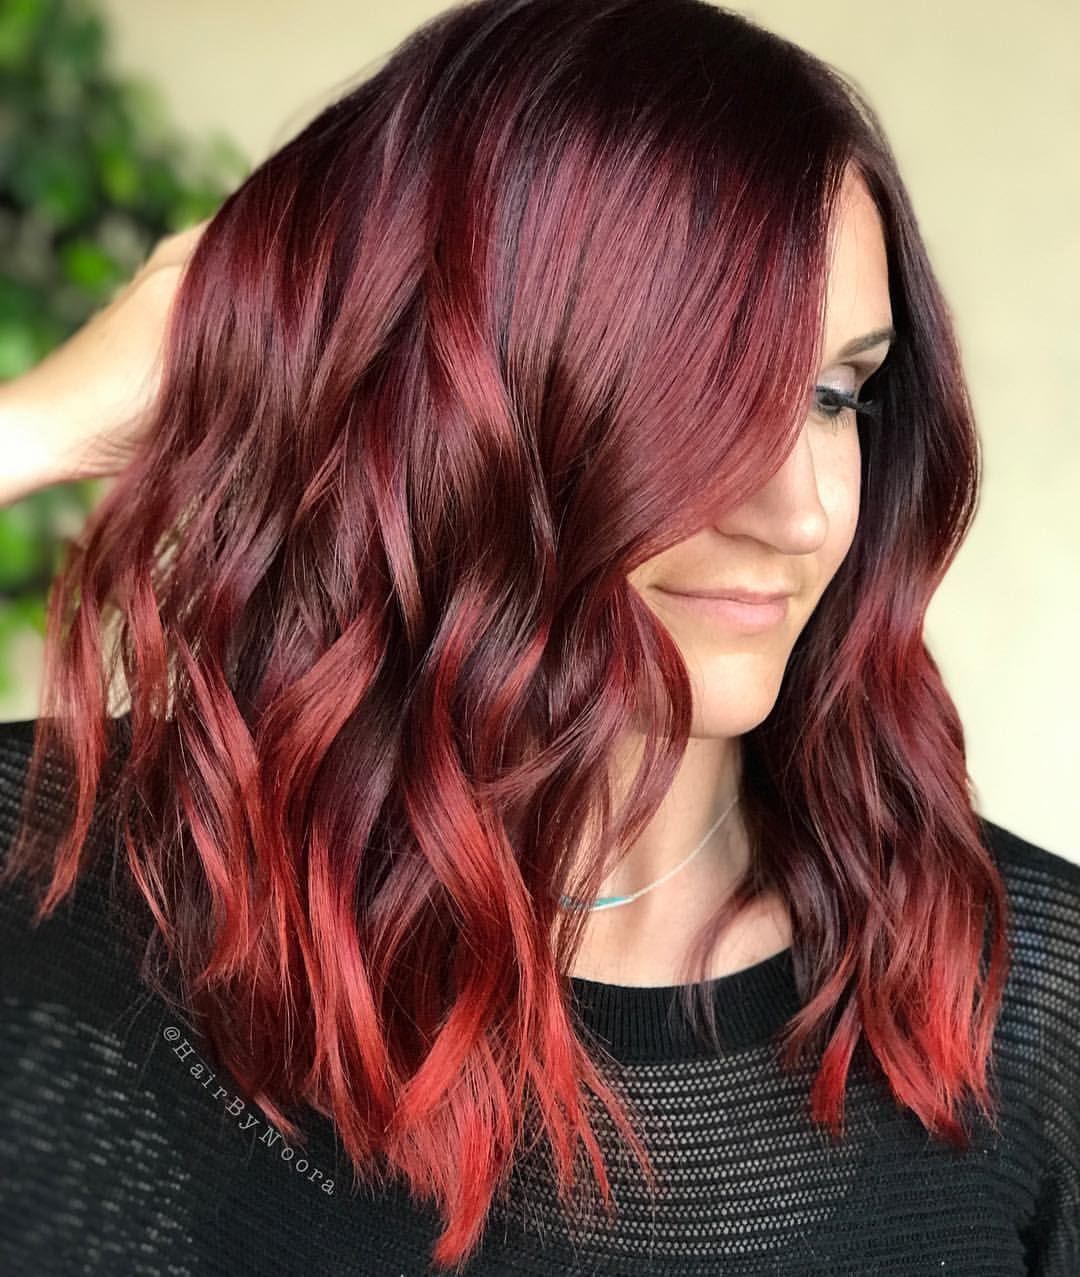 283 Curtidas 8 Comentarios Noora A Ahmad Hairbynoora No Instagram G I R L On F I R E I Just Can T Ge Wine Hair Maroon Hair Red Balayage Hair